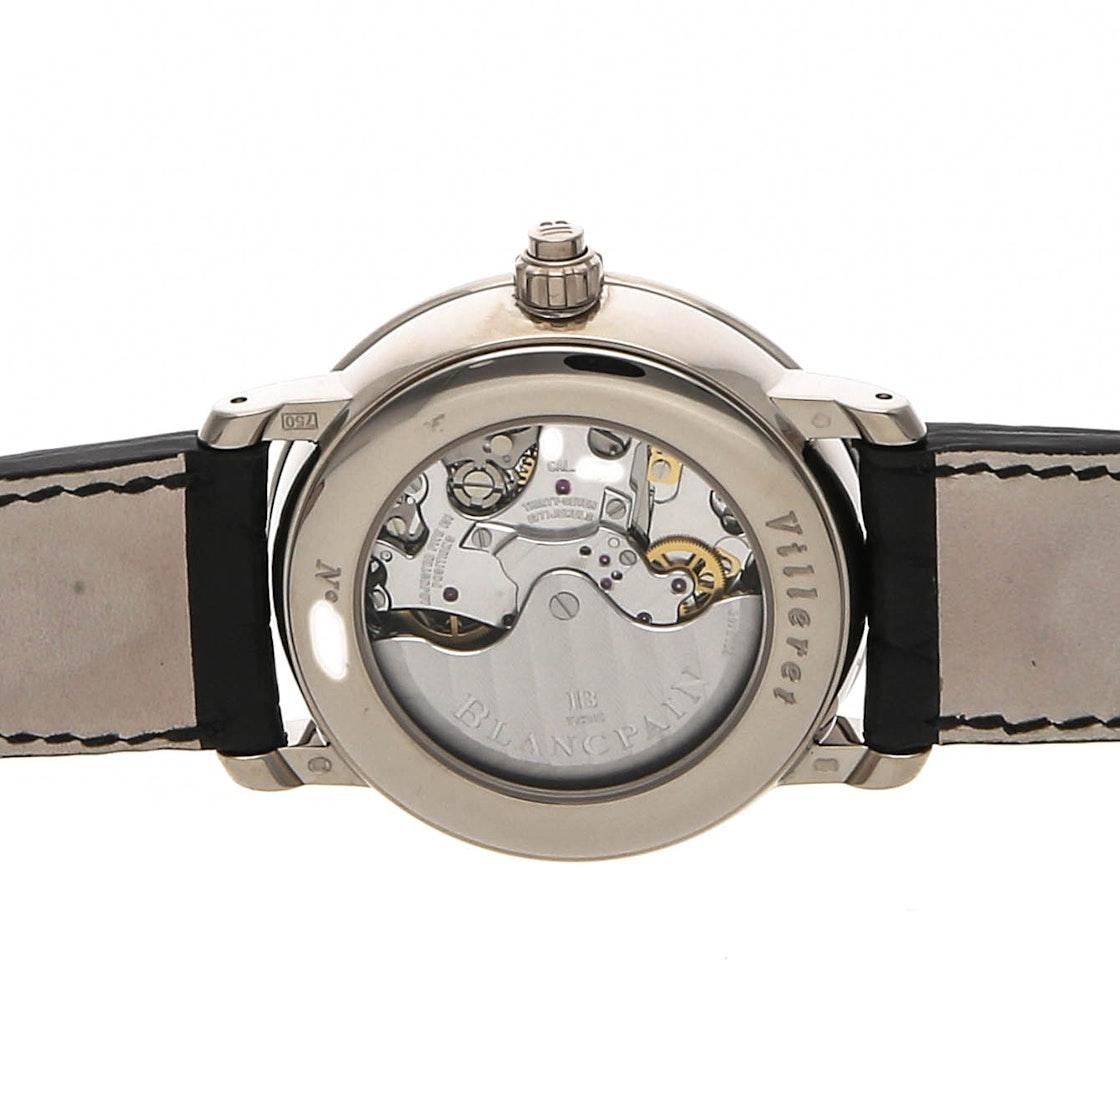 Blancpain Villeret Chronographe Monopusher 6185-1546-55B